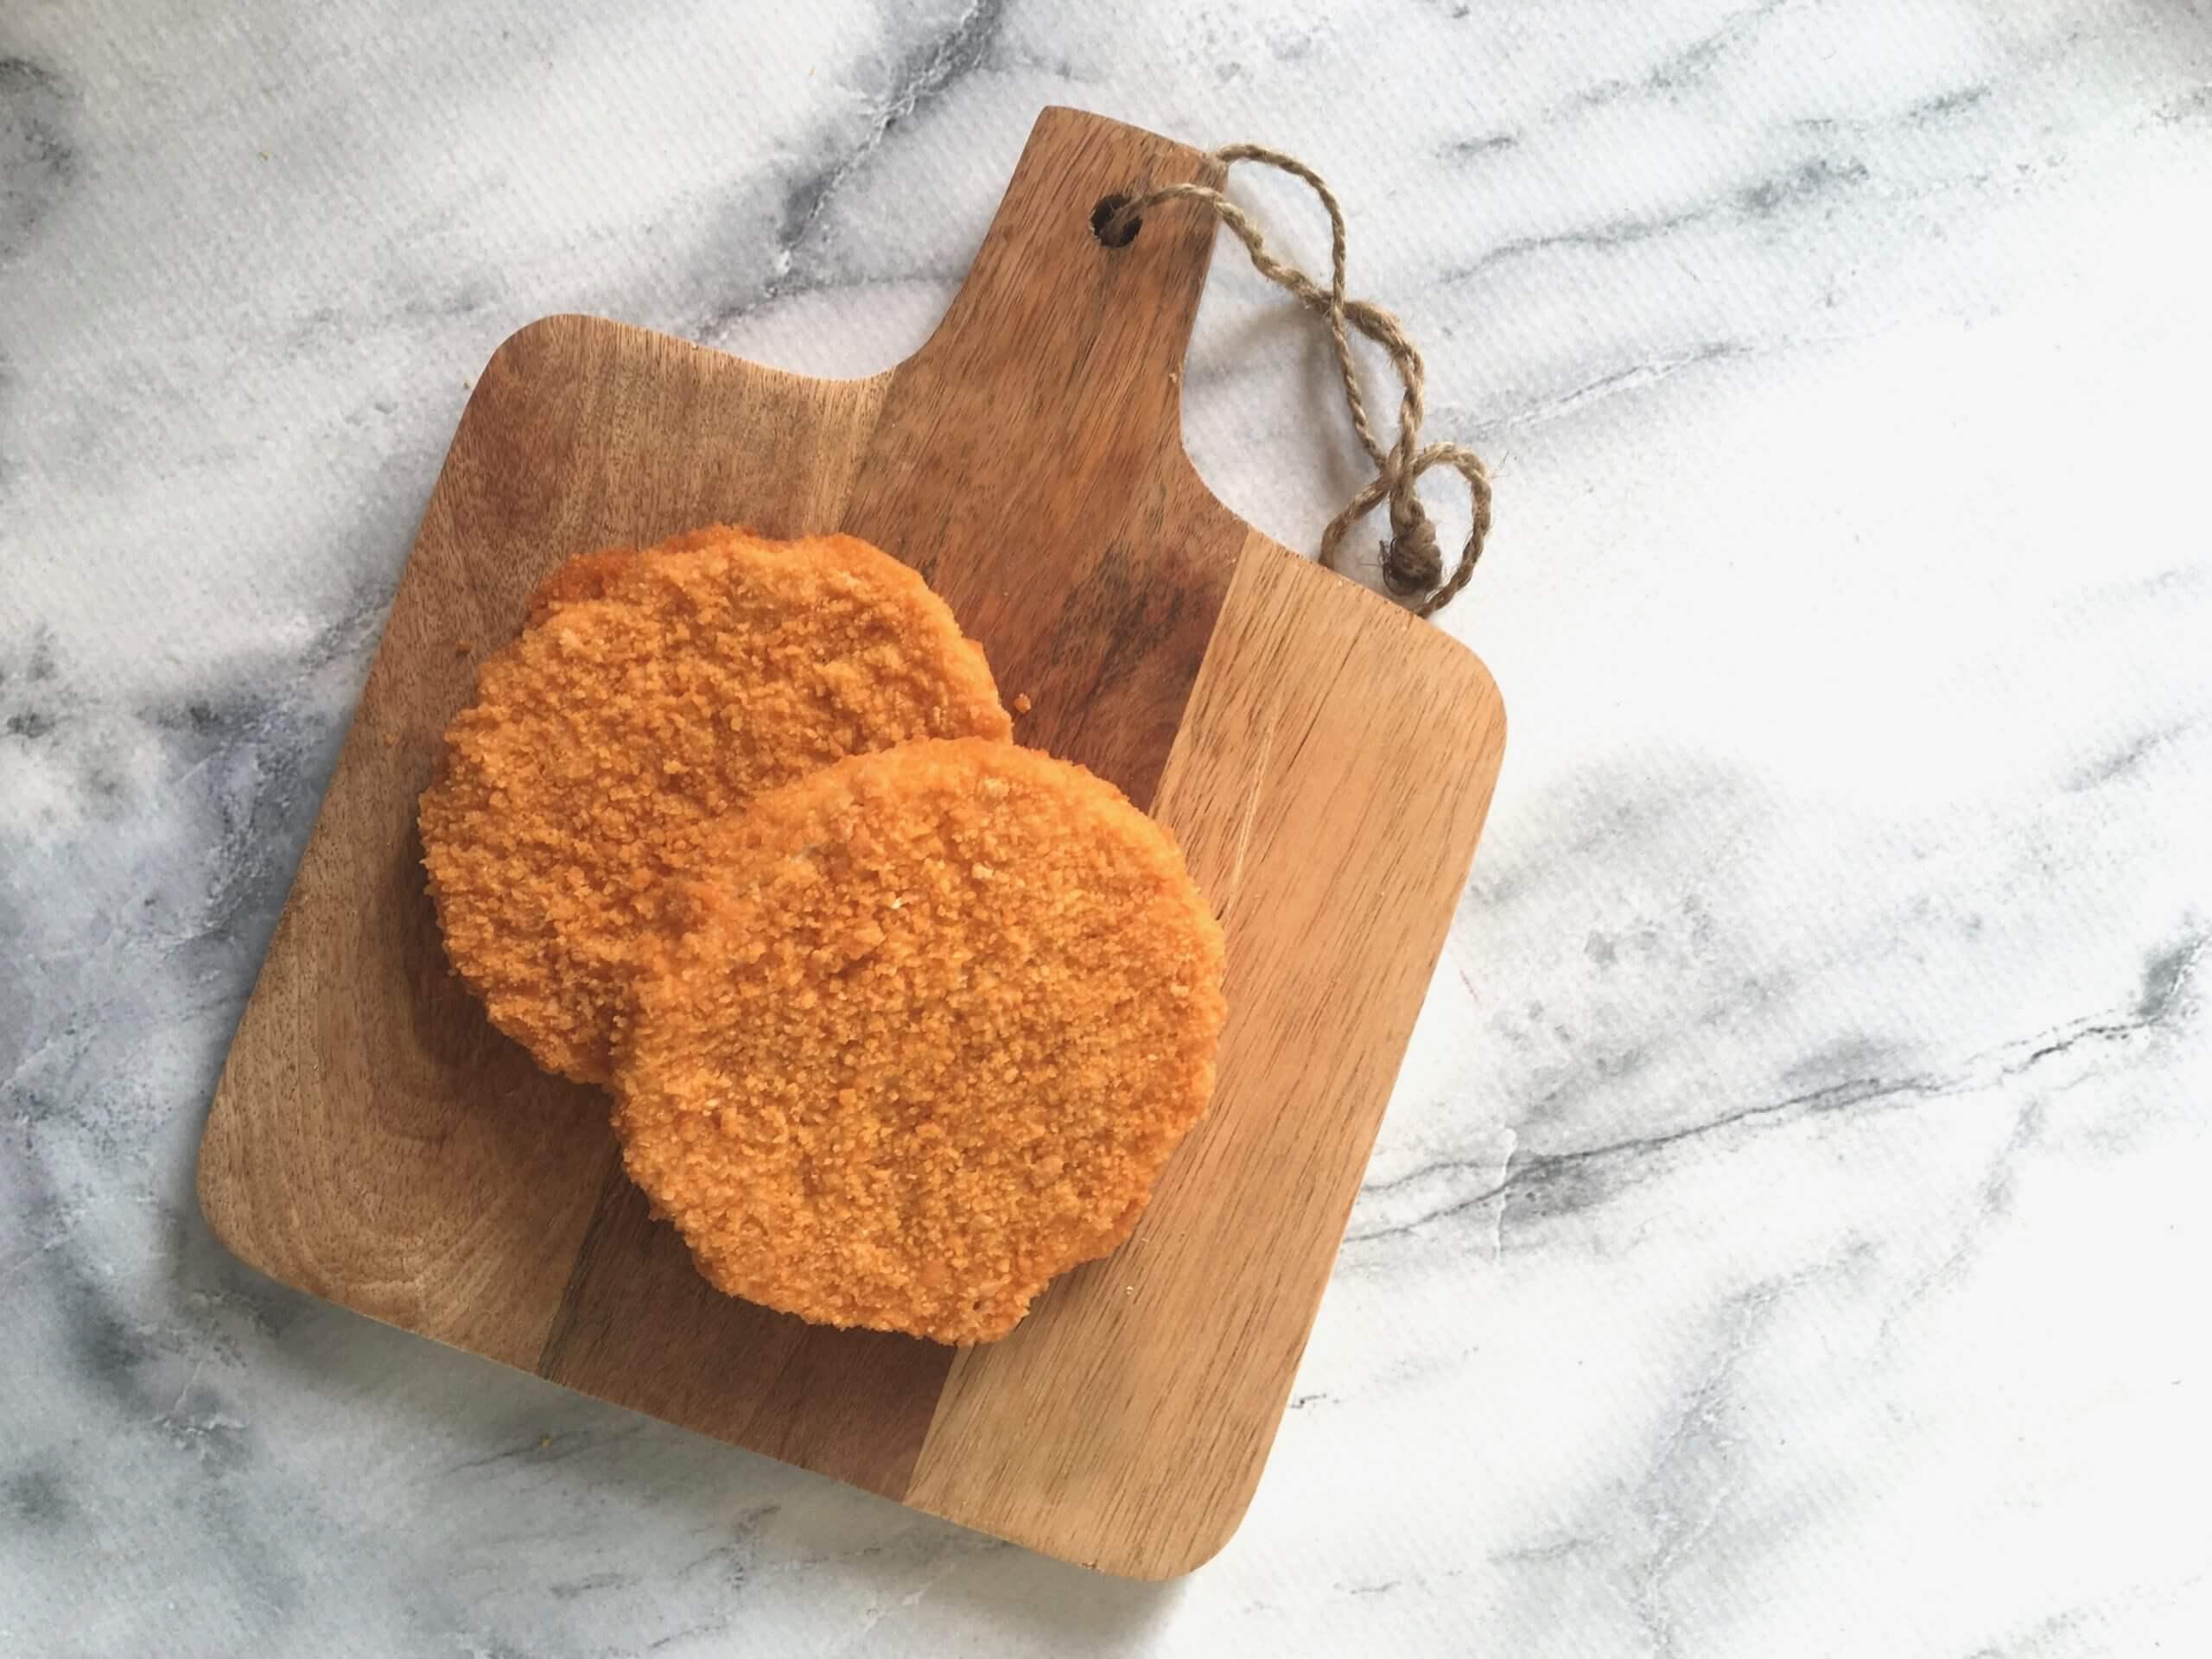 Vleesvervanger getest: SoFine SoFish burgers